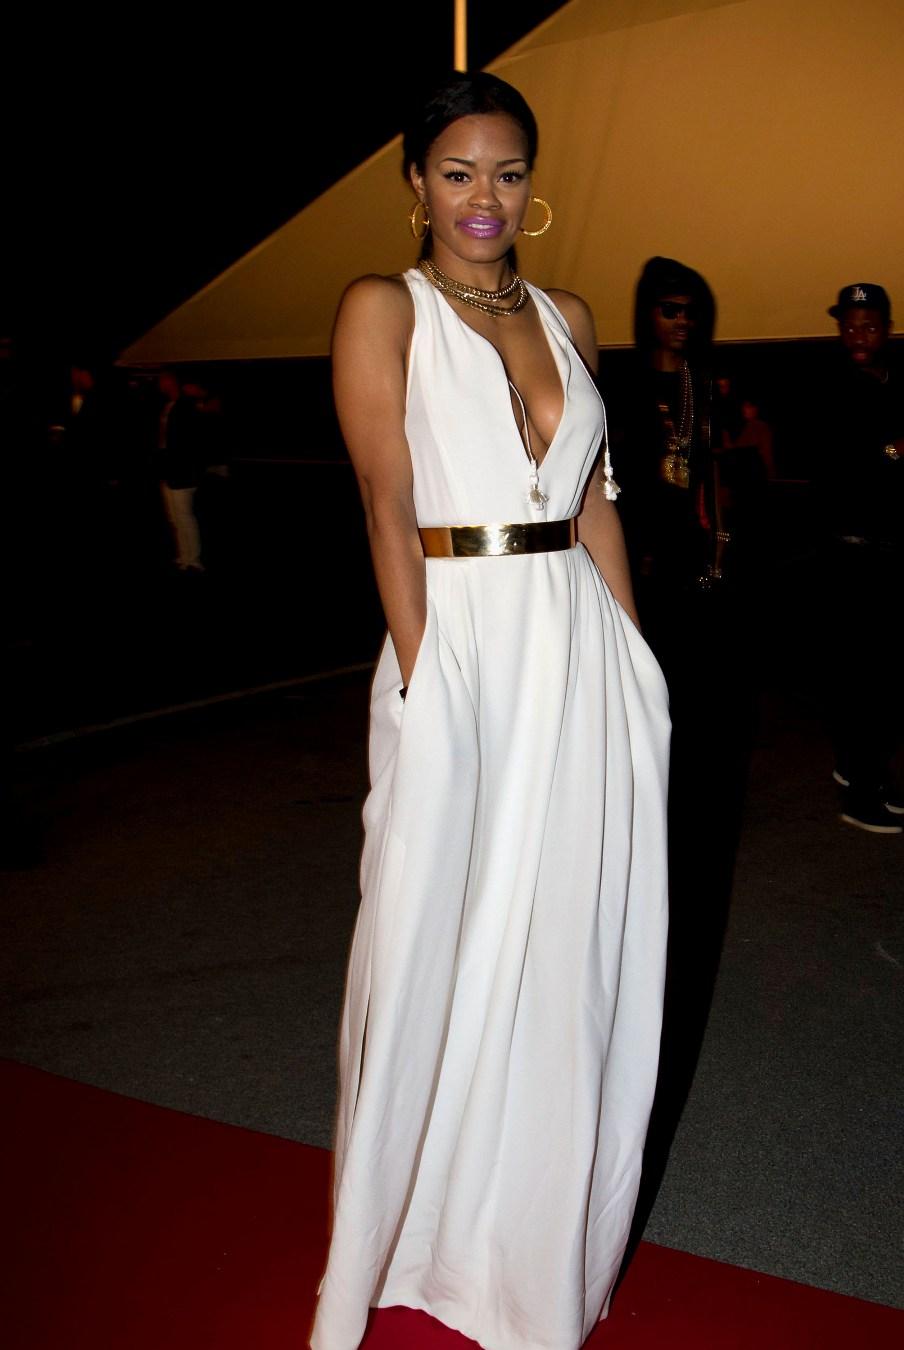 Love The Look Teyana Taylor Samtyms